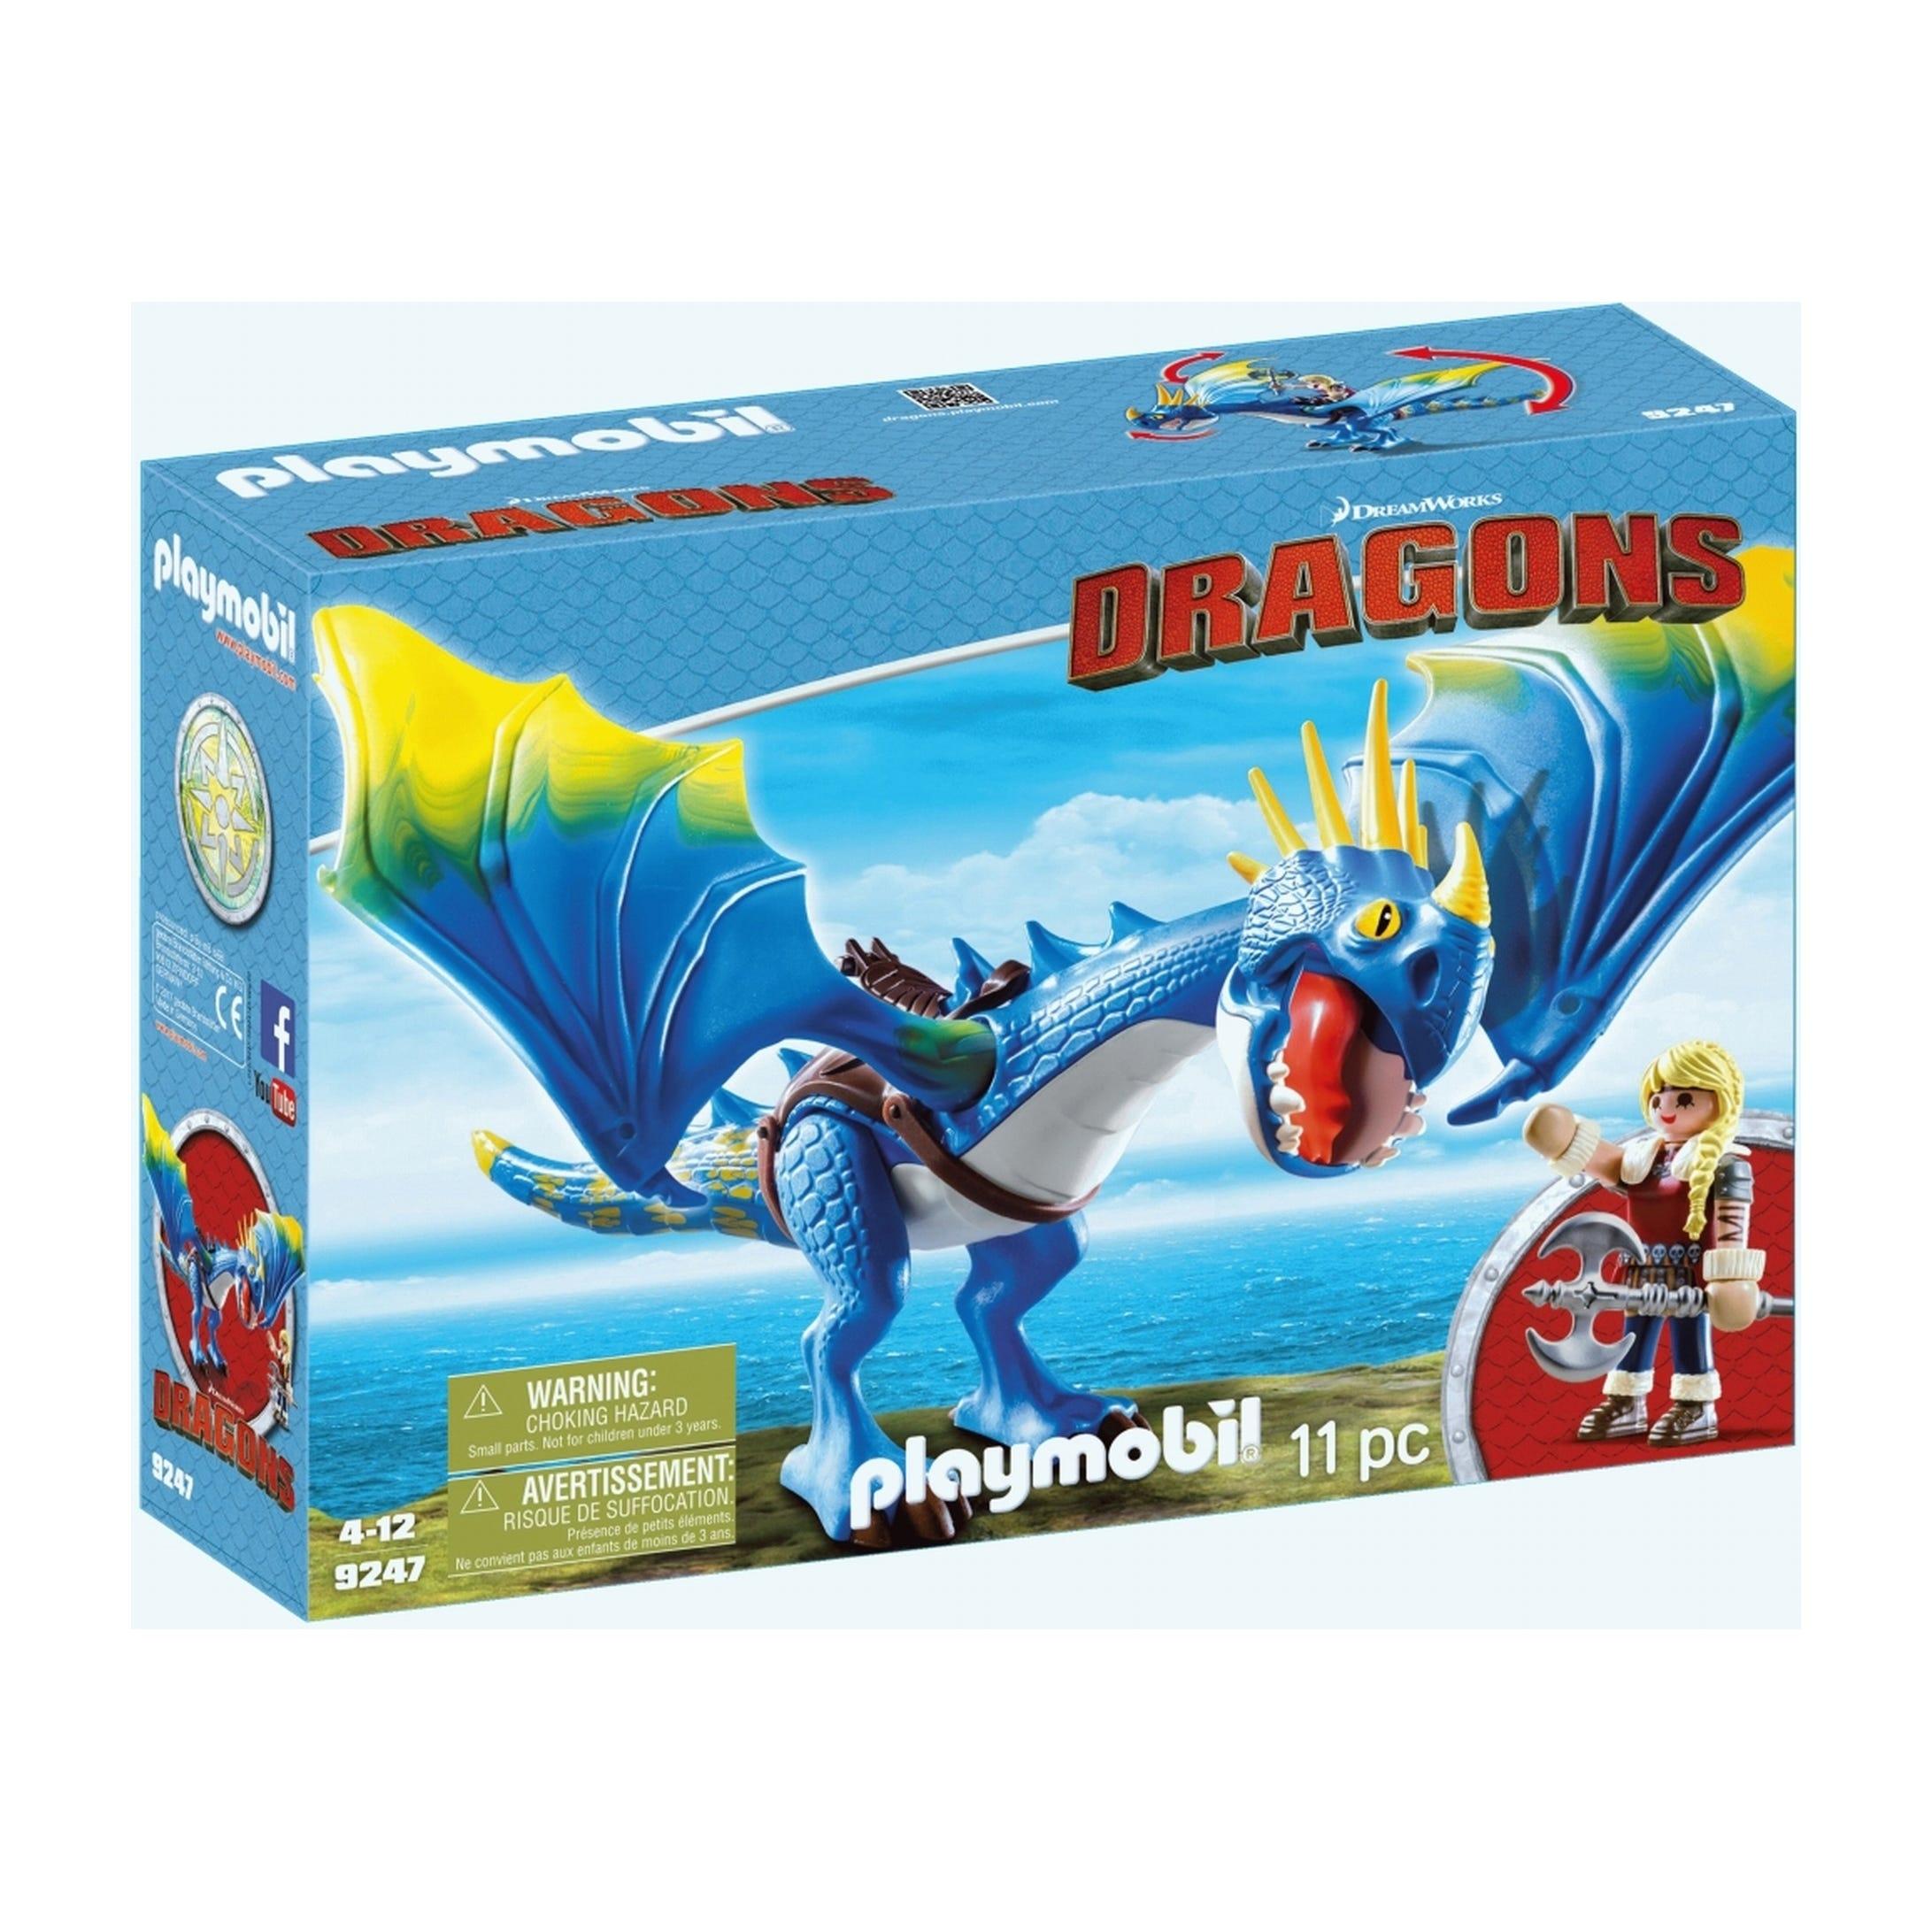 Playmobil Dreamworks Dragons Astrid & Stormfly 9247